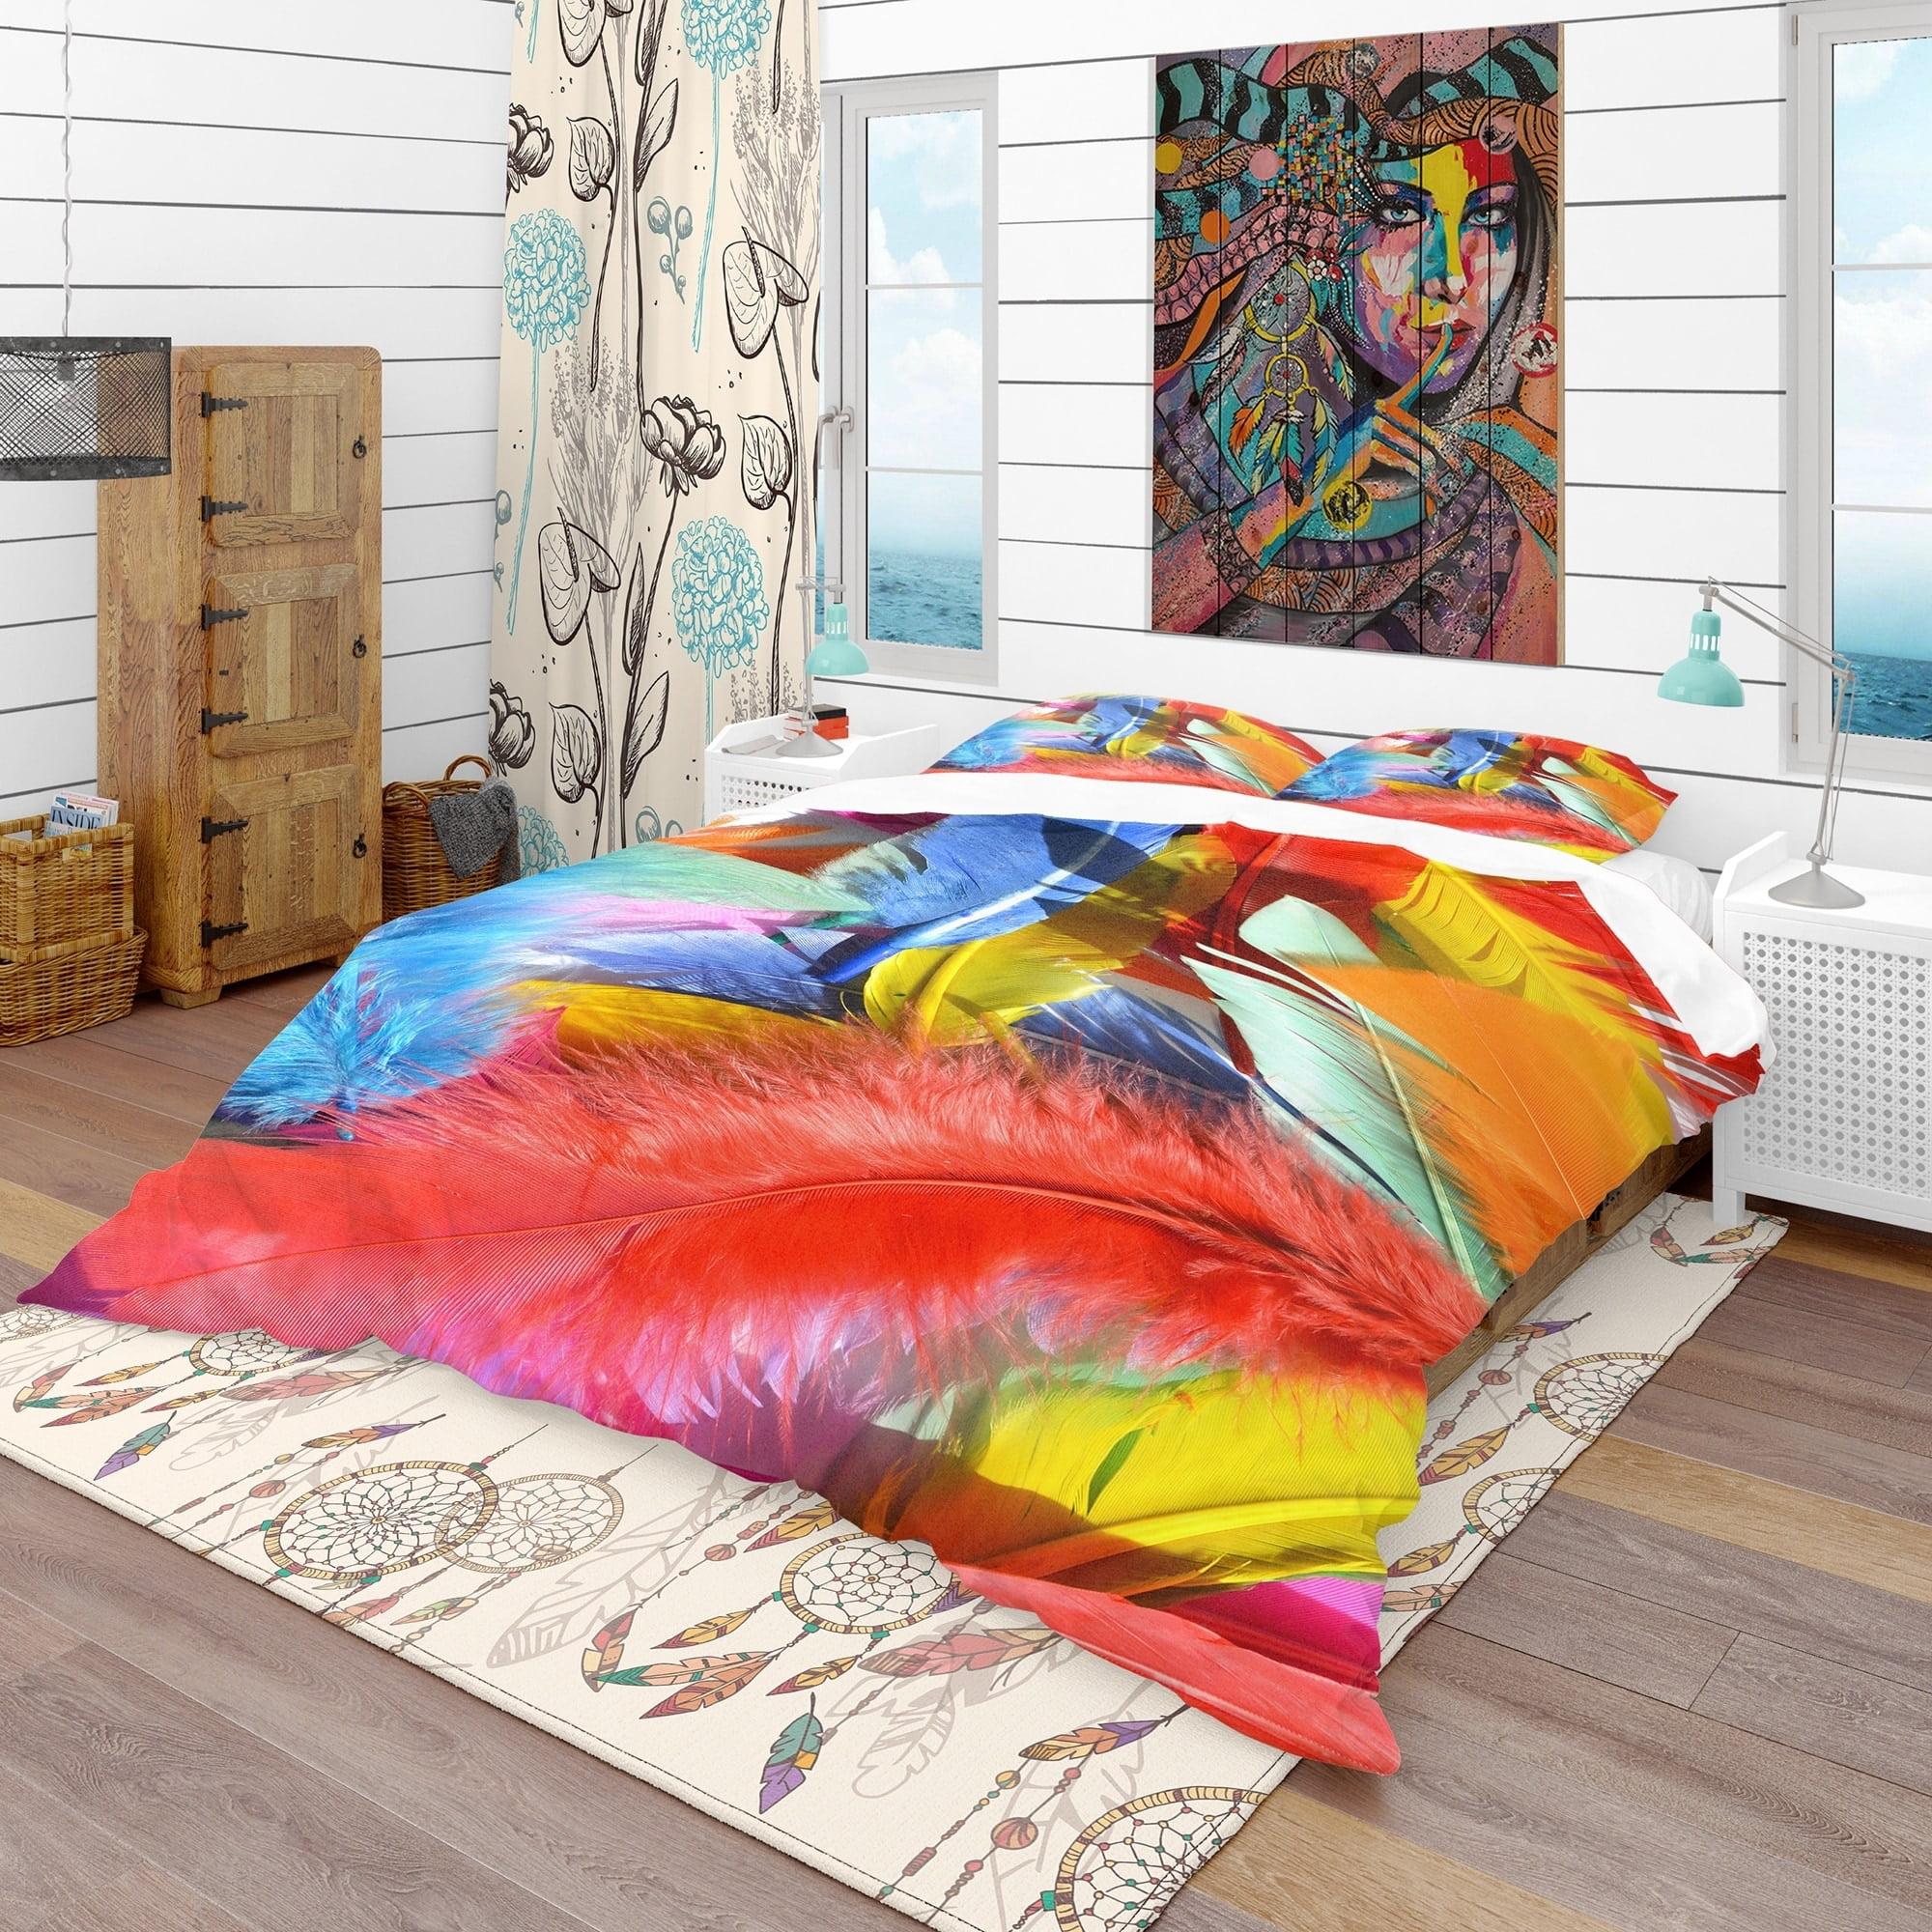 DESIGN ART Designart 'Feathers Texture' Southwestern Bedding Set - Duvet Cover & Shams